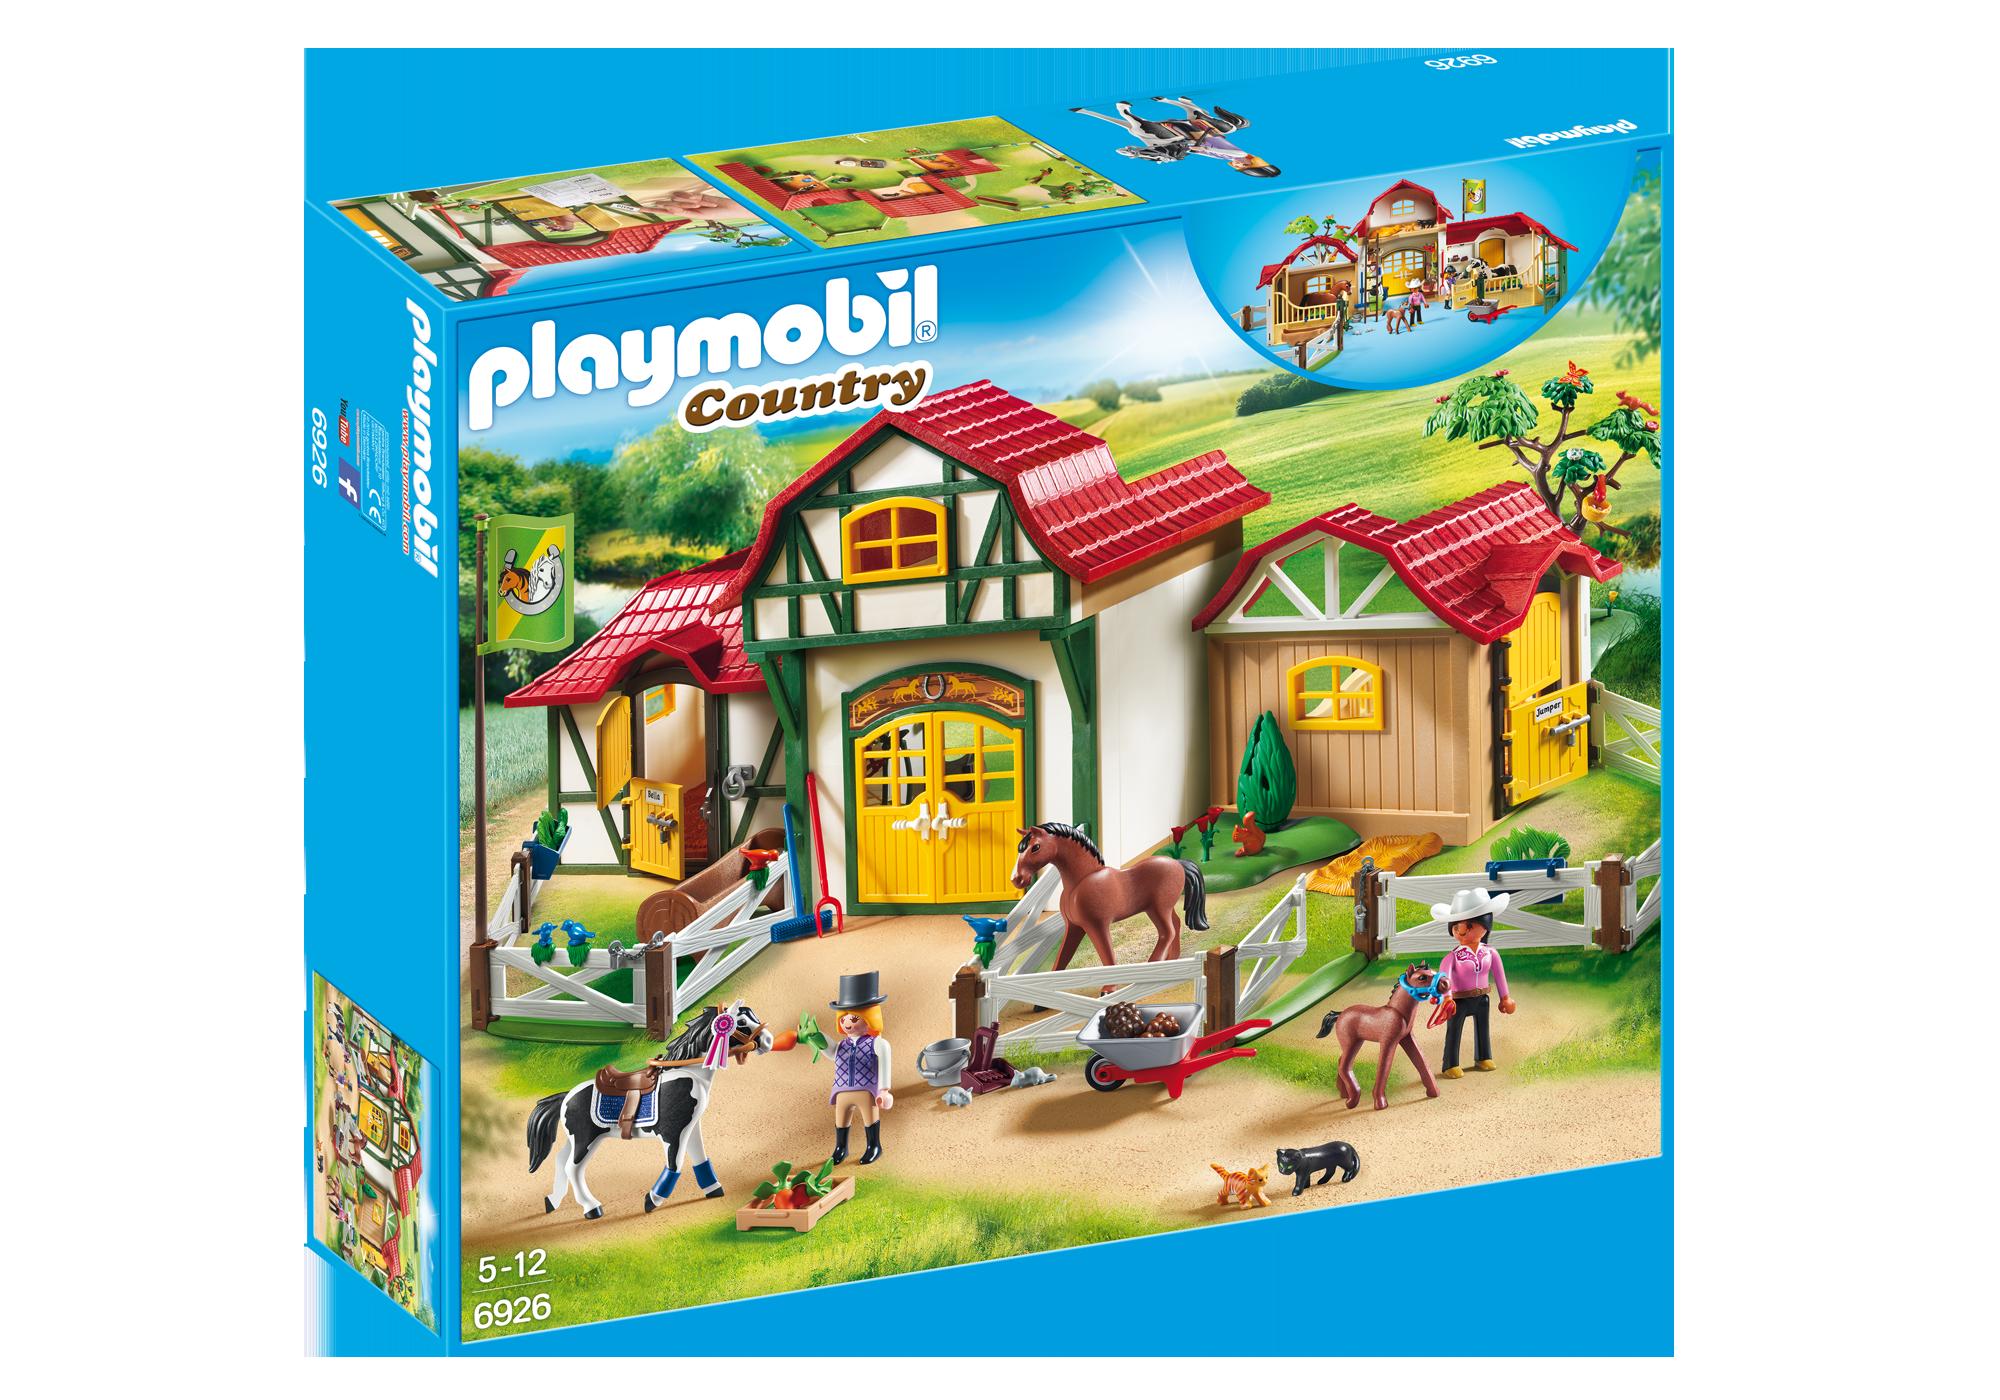 http://media.playmobil.com/i/playmobil/6926_product_box_front/Club d'équitation